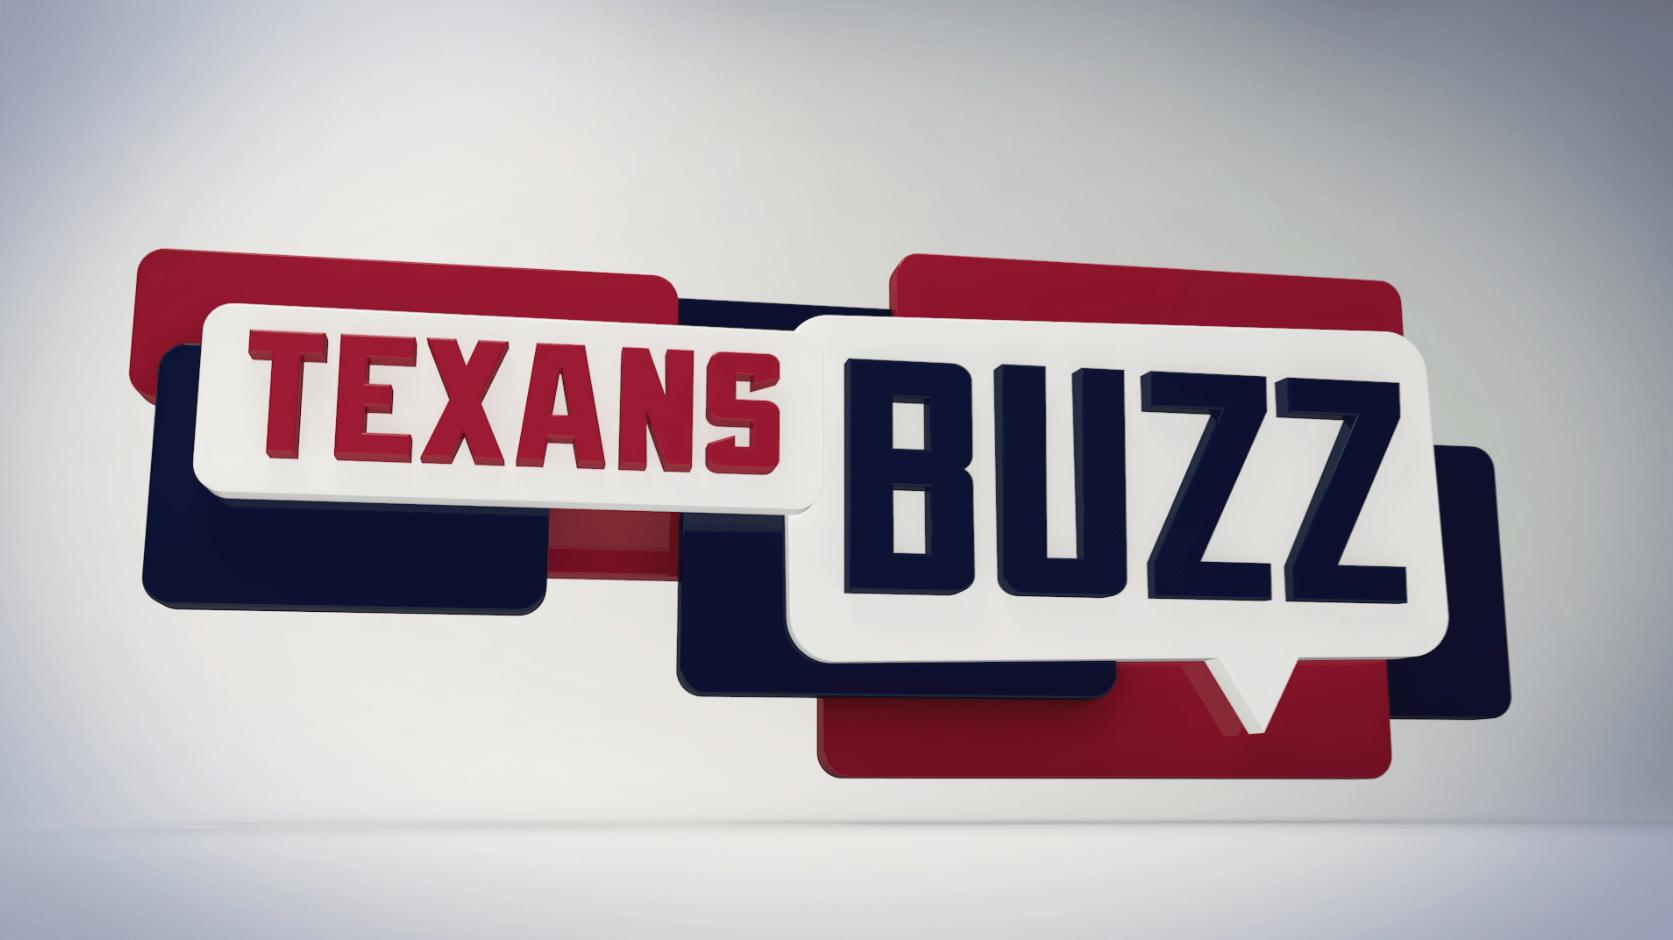 Texans Buzz: Saturdays at 11 PM